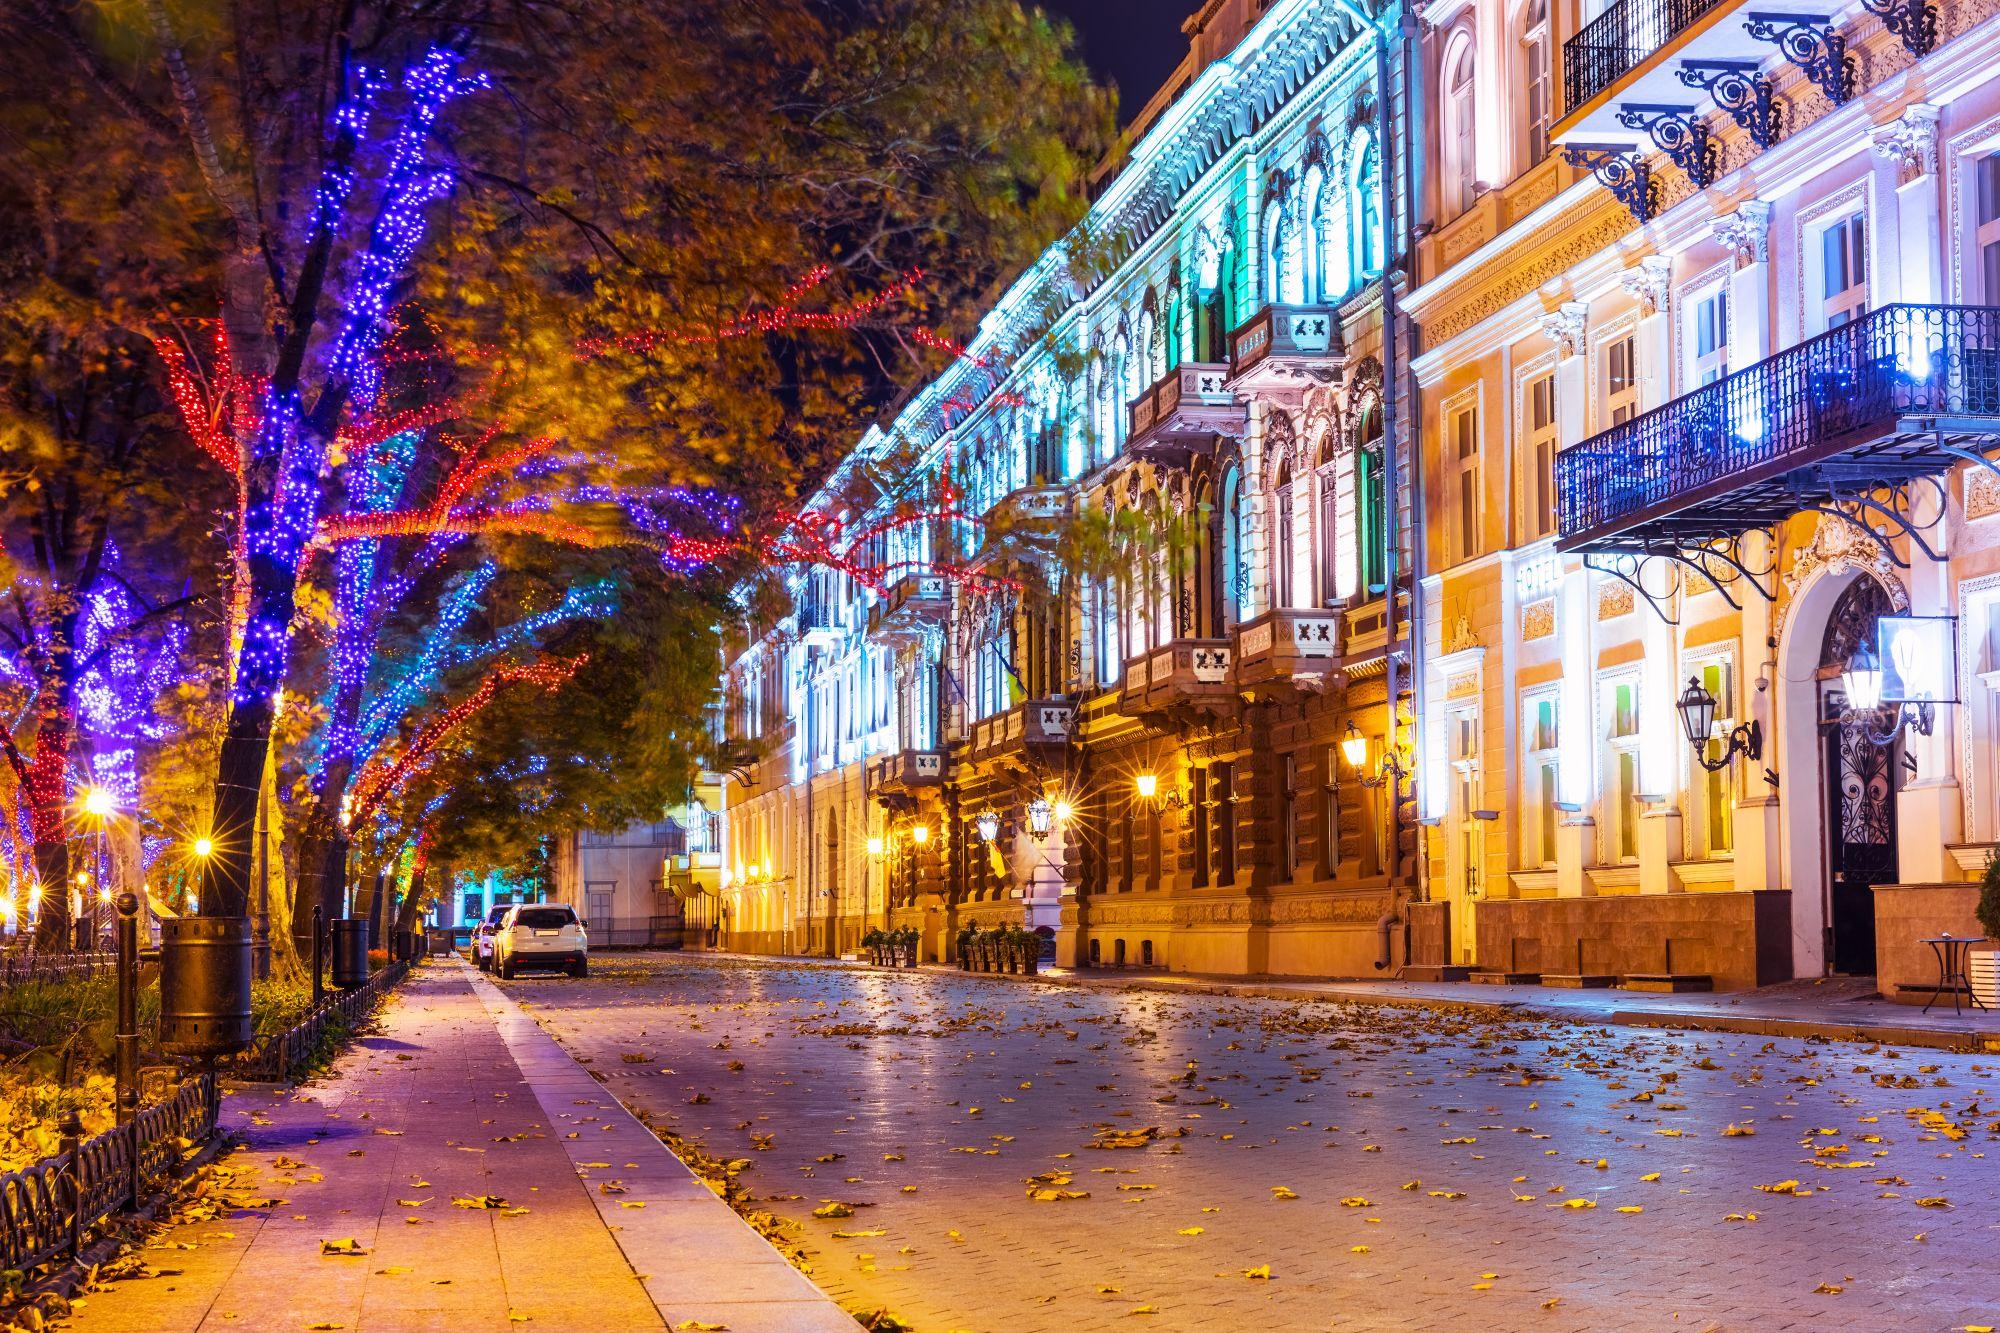 Ulica w Odessie